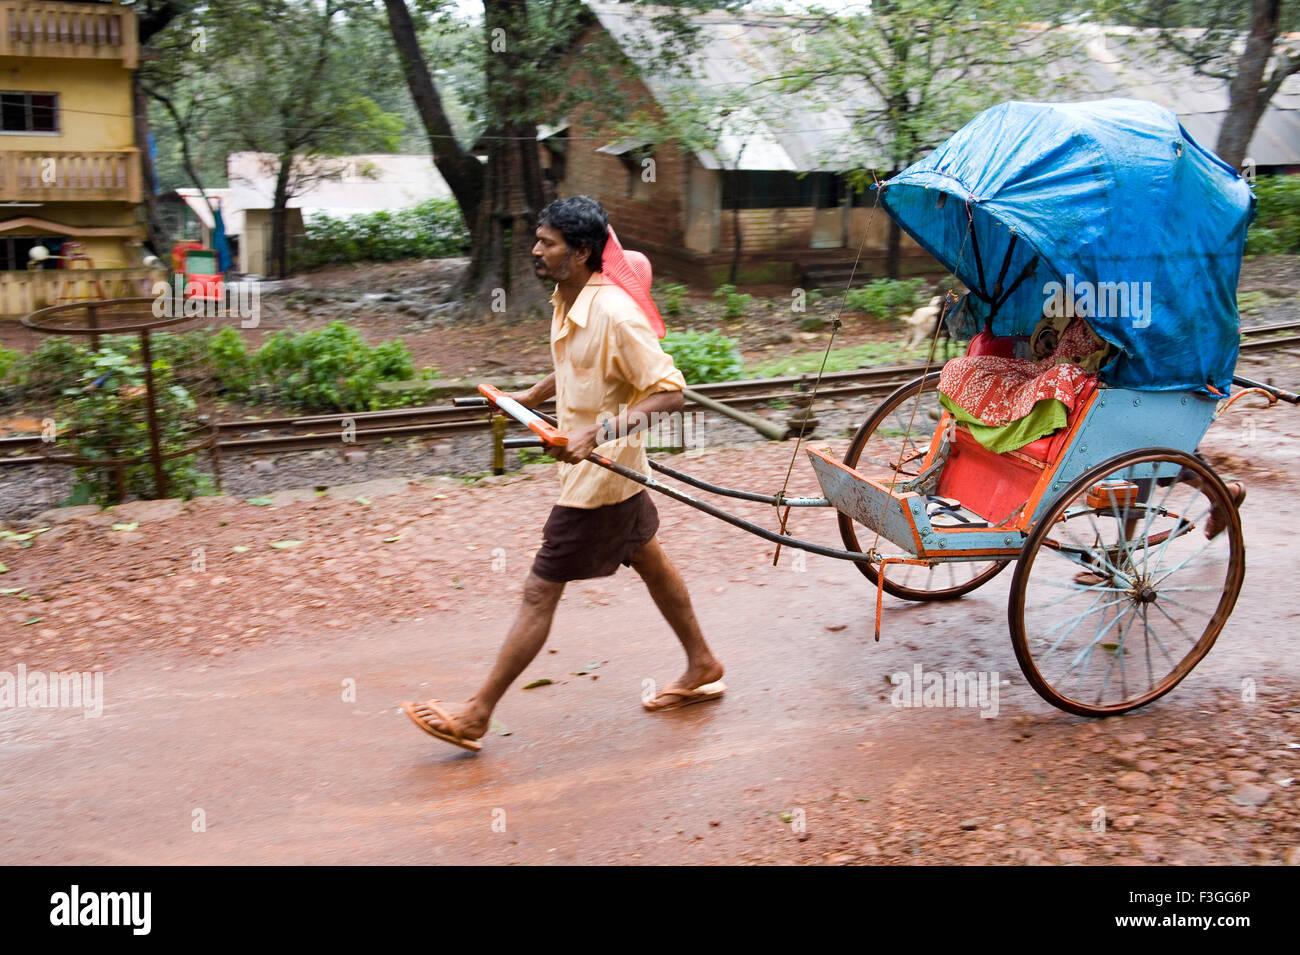 Man driven pulled rickshaw ; Matheran ; Maharashtra ; India - Stock Image